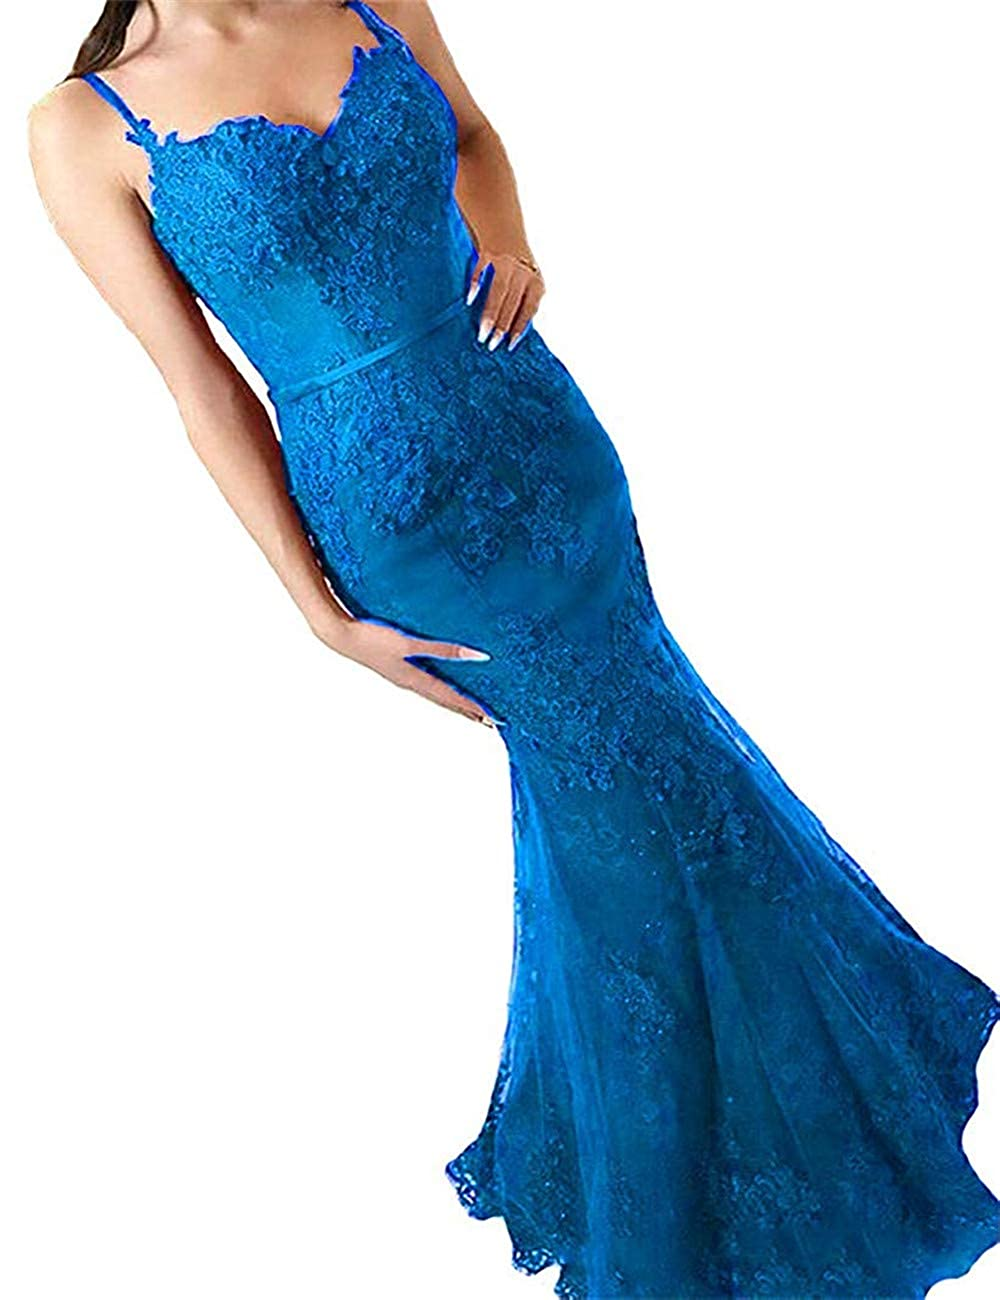 bluee Sophie Women's Mermaid Full Lace Prom Dresses Spaghetti Straps Long Formal Evening Dress S164